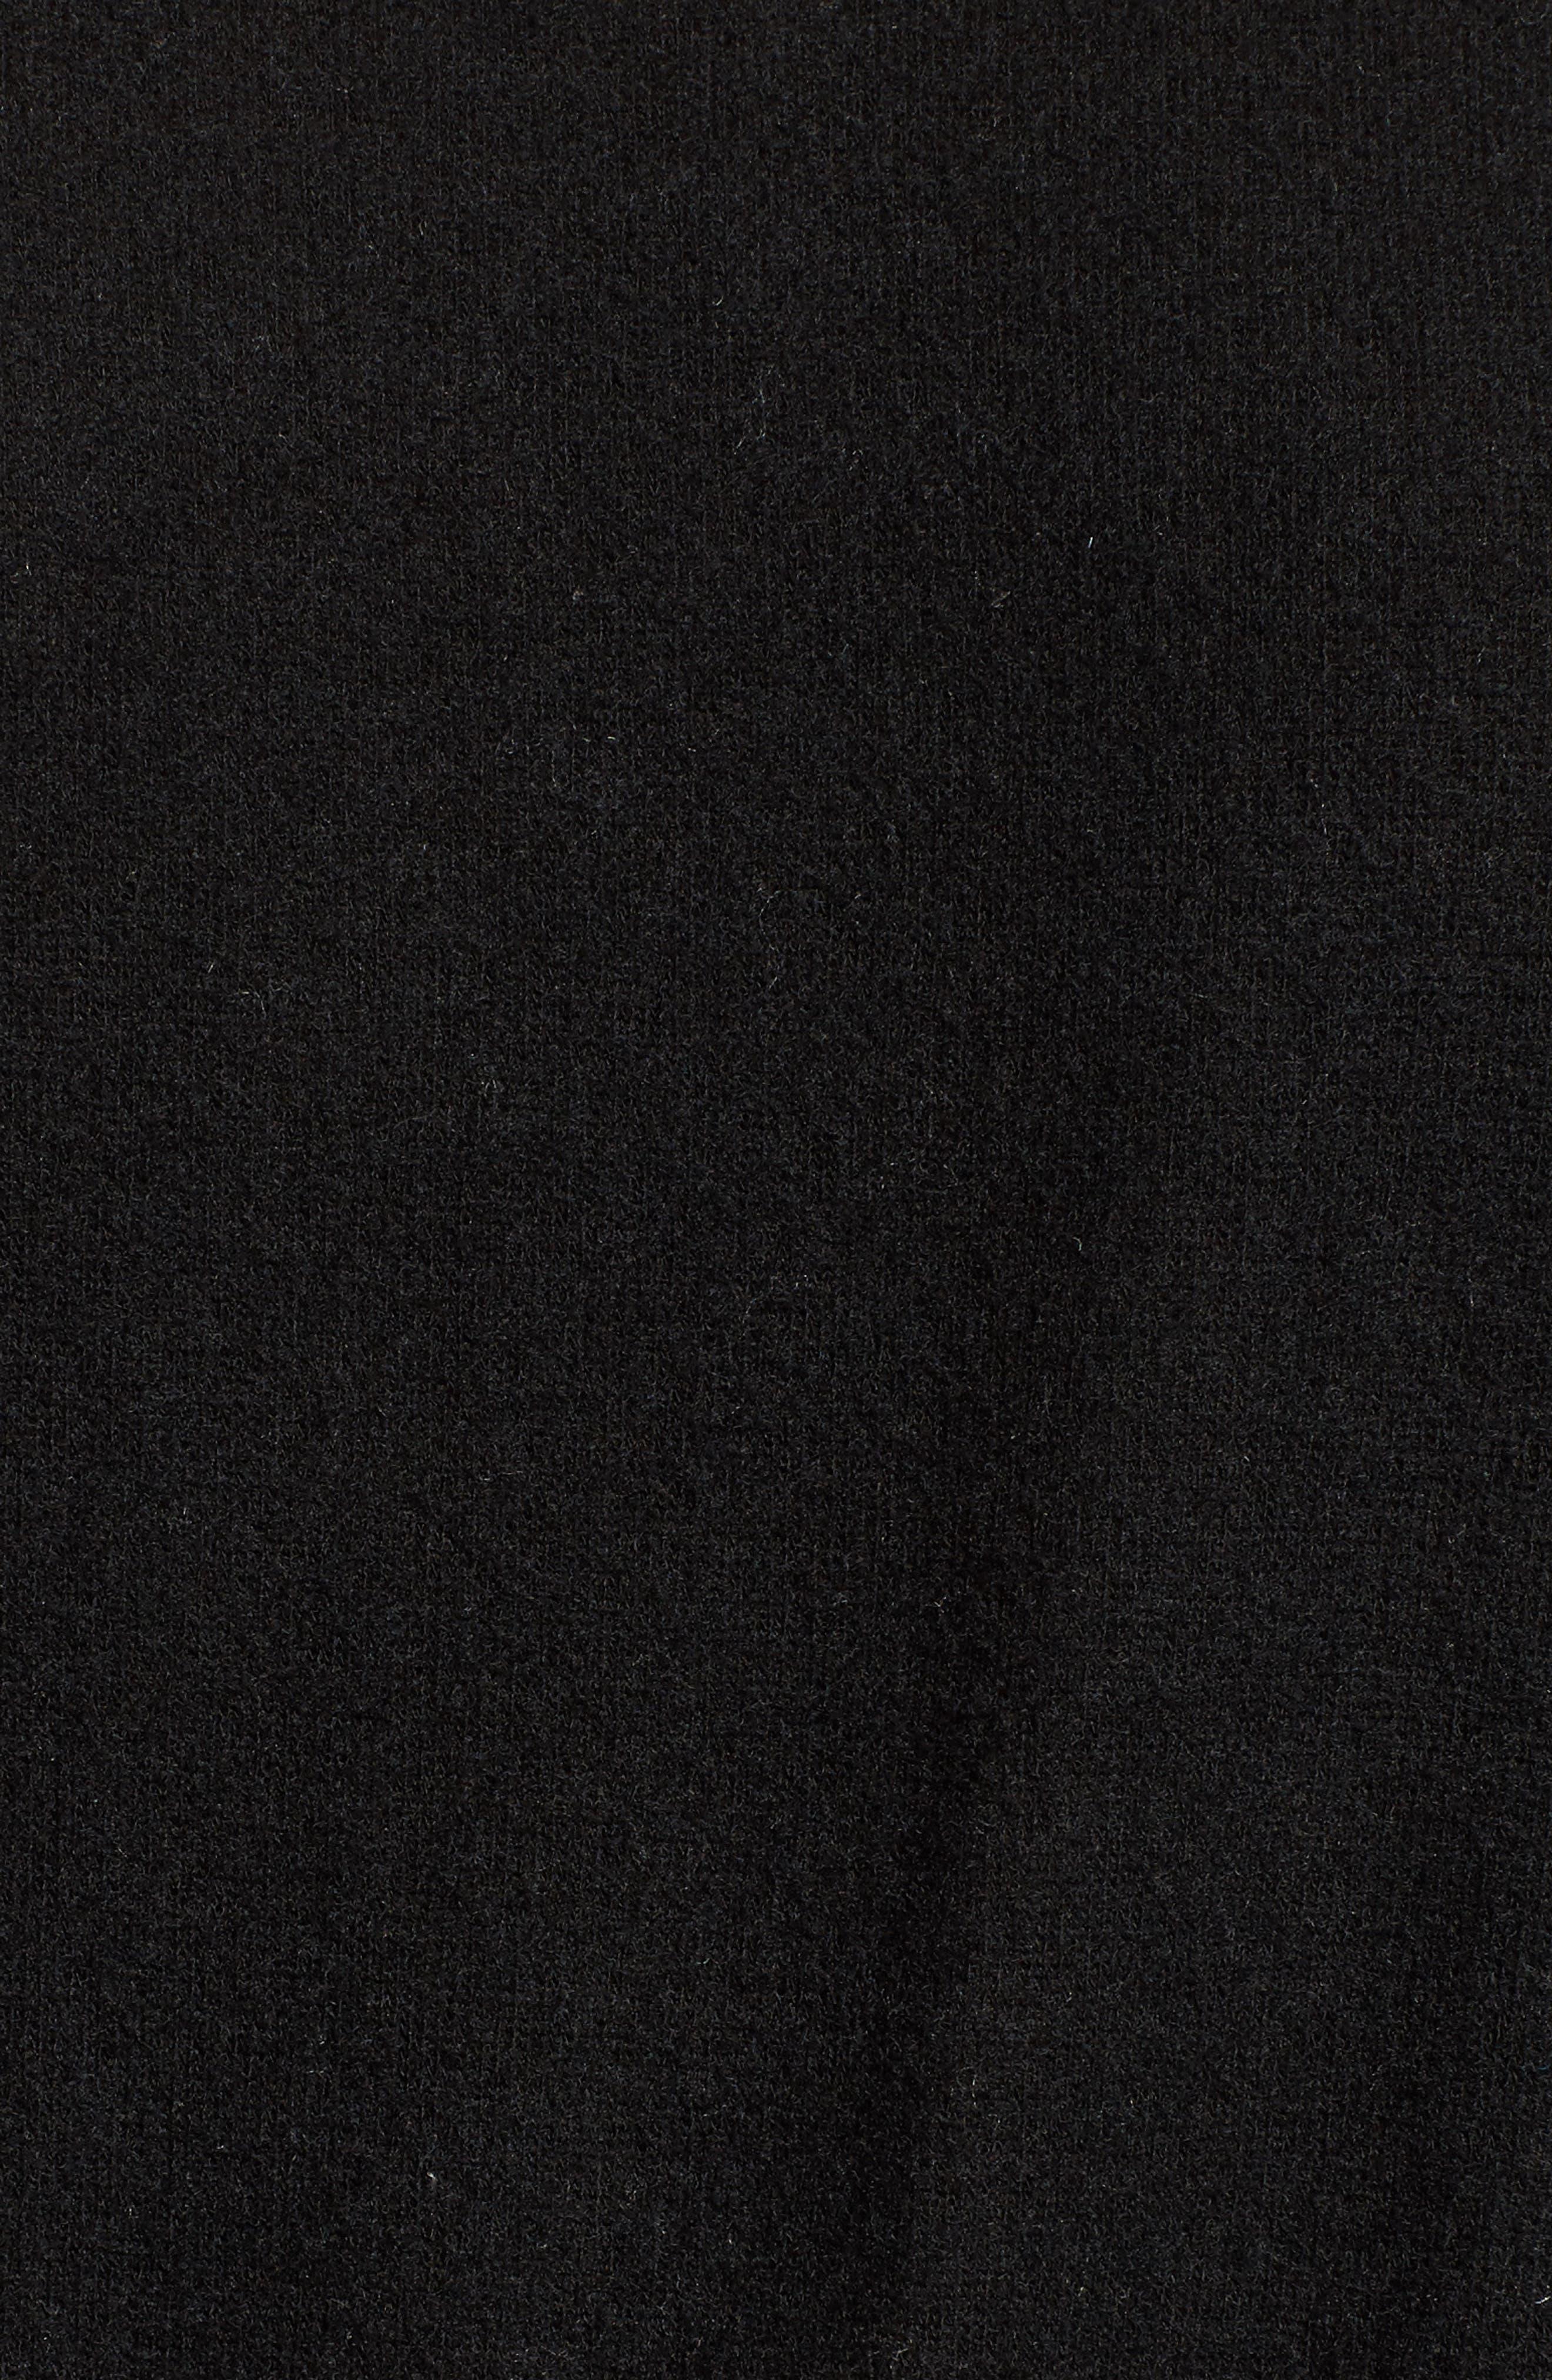 Brushed Smocked Sweatshirt,                             Alternate thumbnail 5, color,                             001